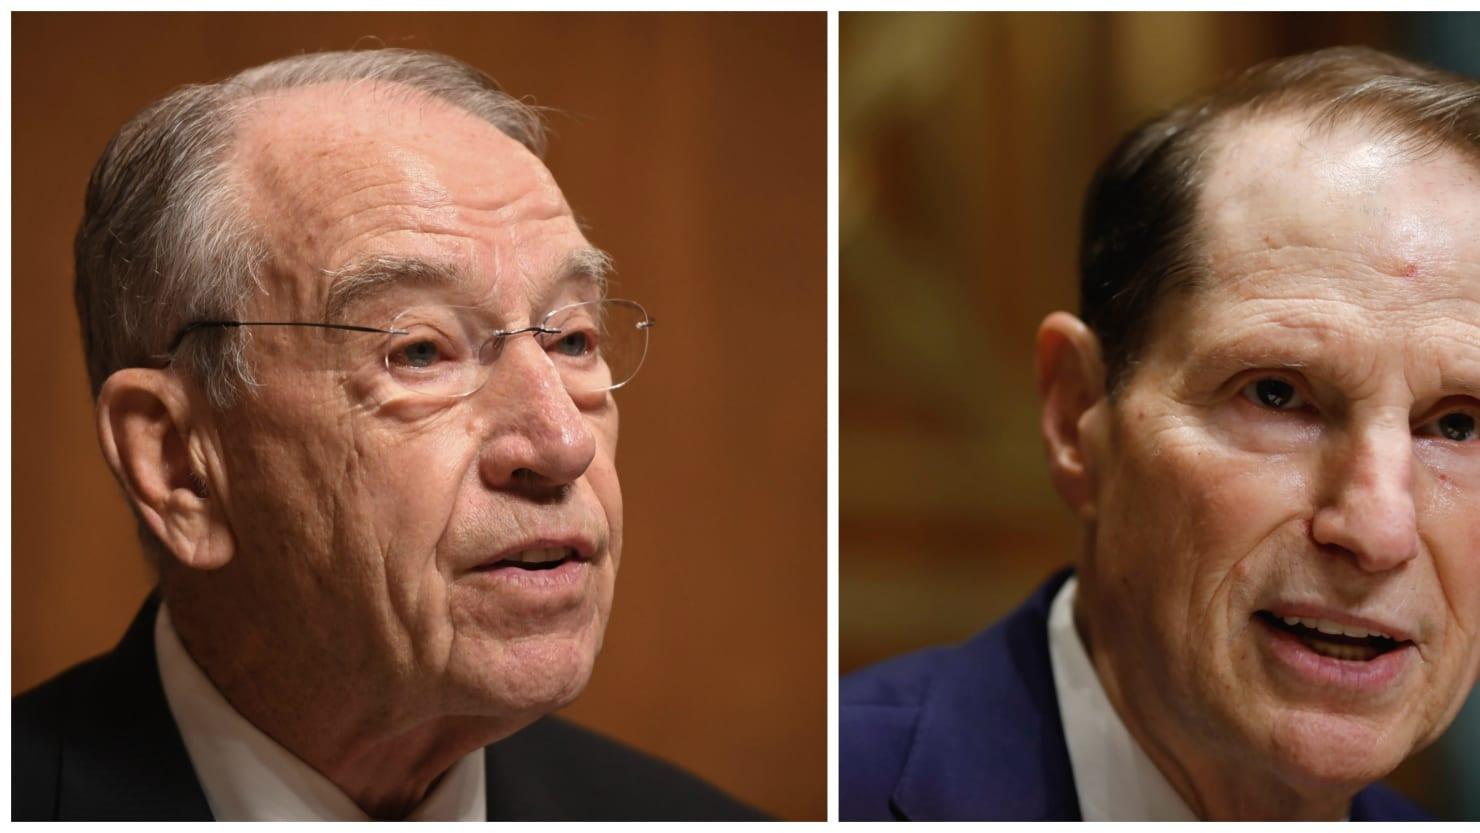 Top Democrat Asks FBI to Refuse to Cooperate With GOP Senators' Ukraine Investigation